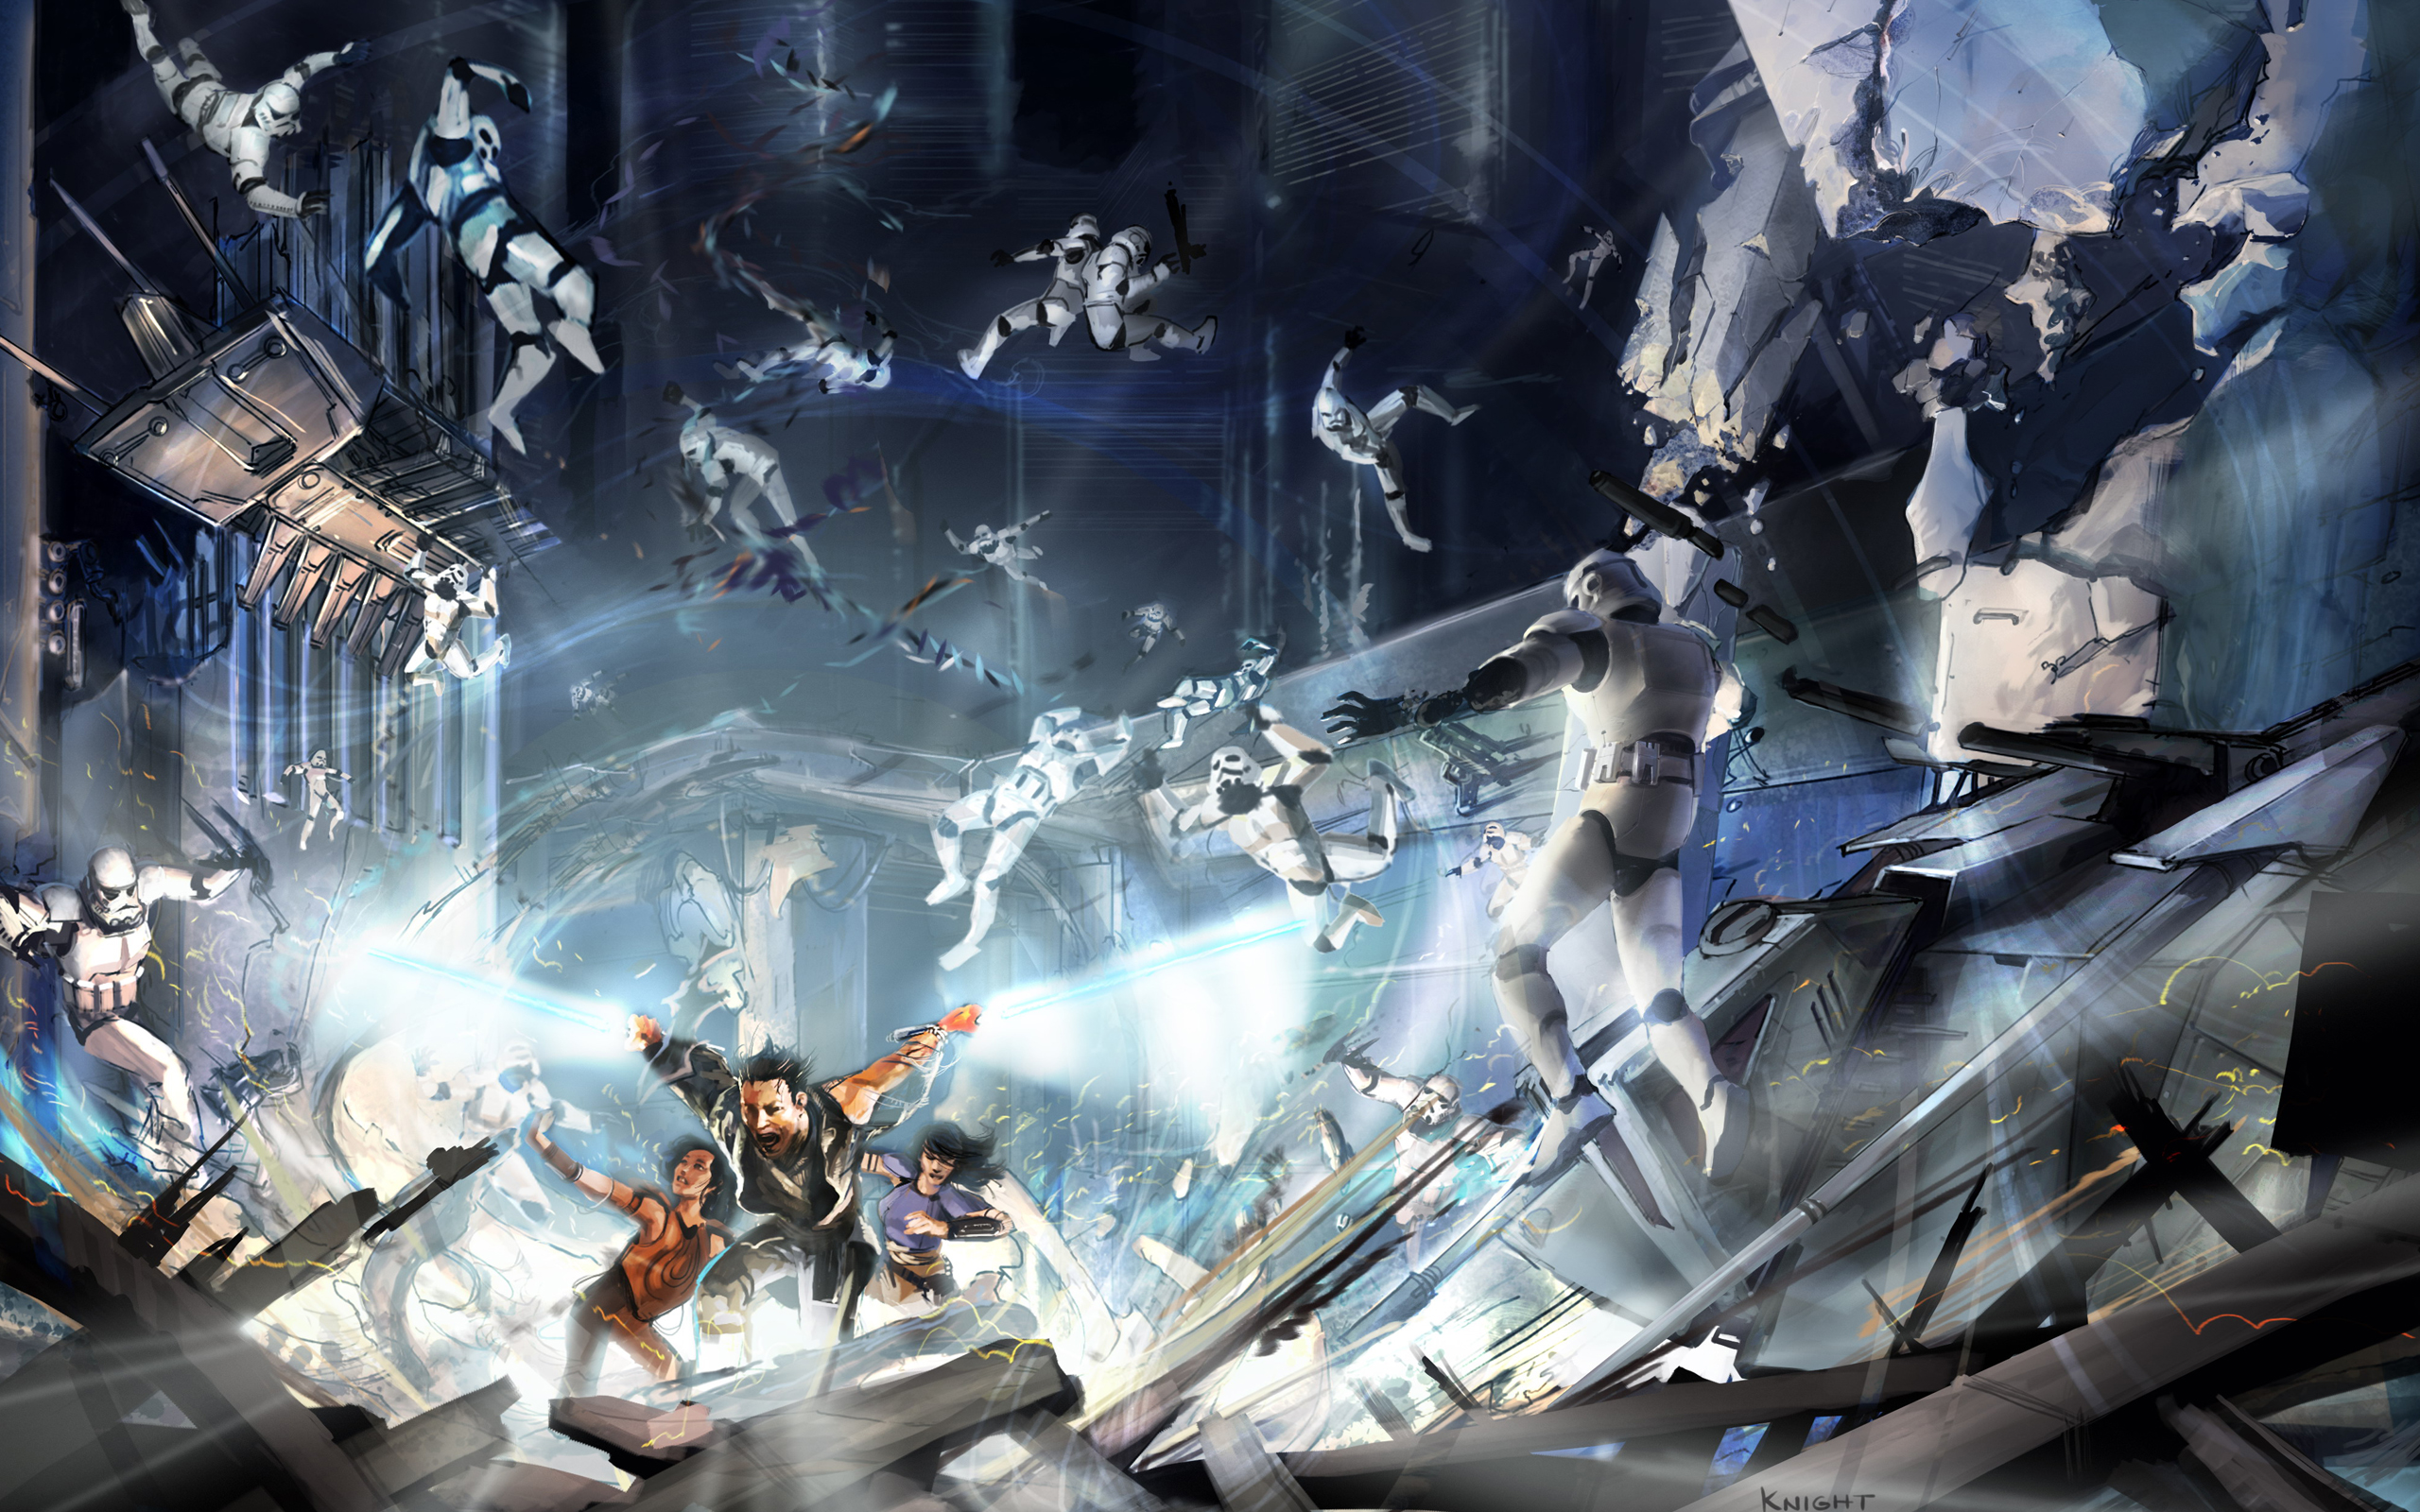 Stormtroopers Lightsabers Wallpaper 2560x1600 Stormtroopers 2560x1600